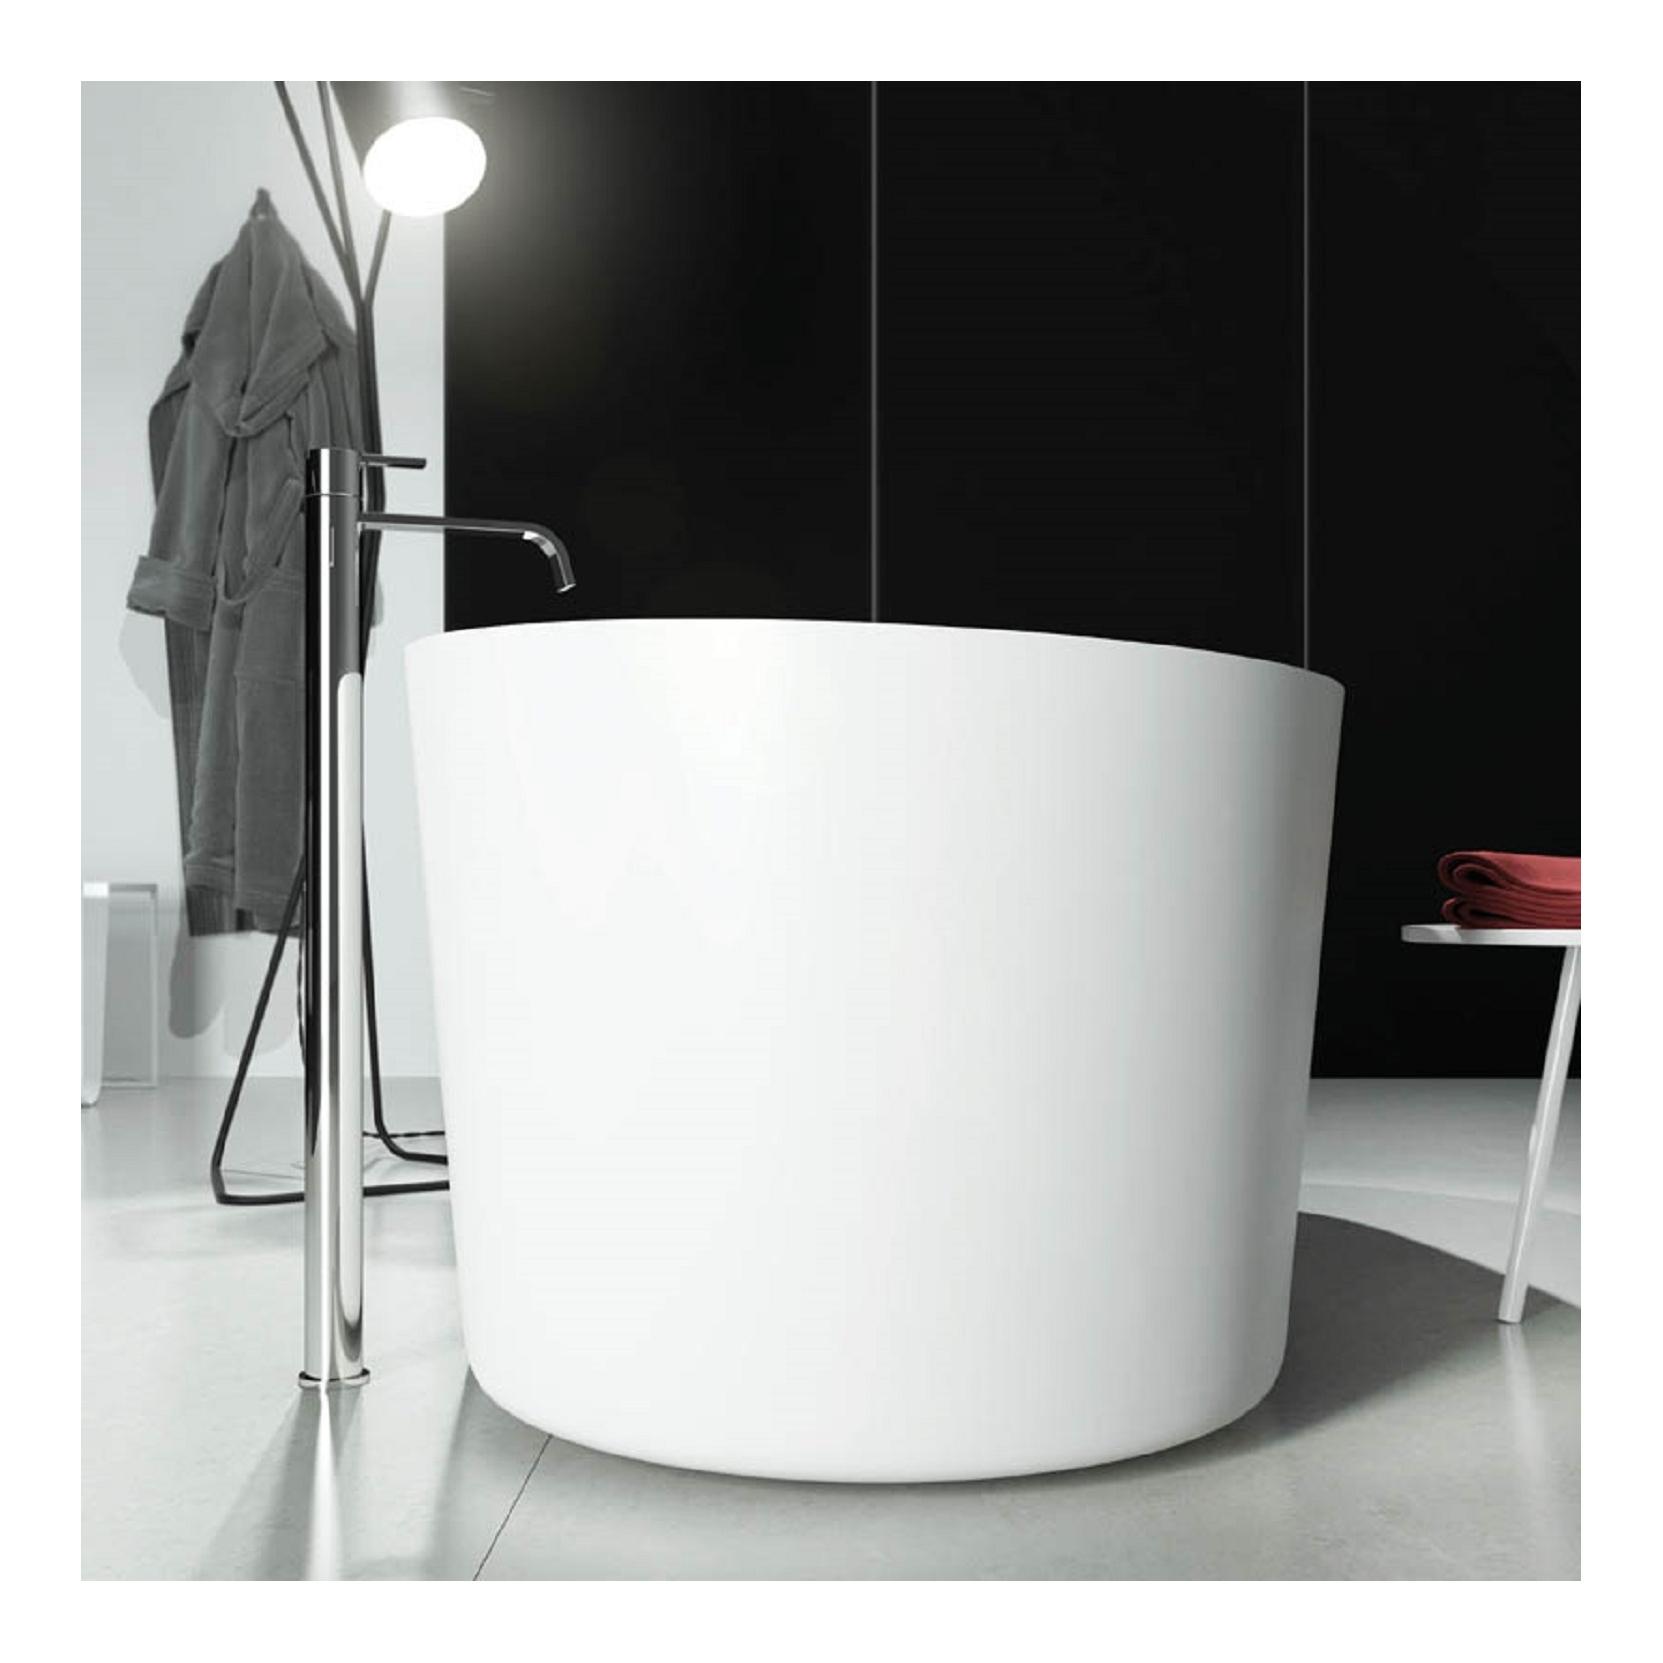 RELAX DESIGN MARECHIARO TUB FREESTANDING BATHTUB - TattaHome